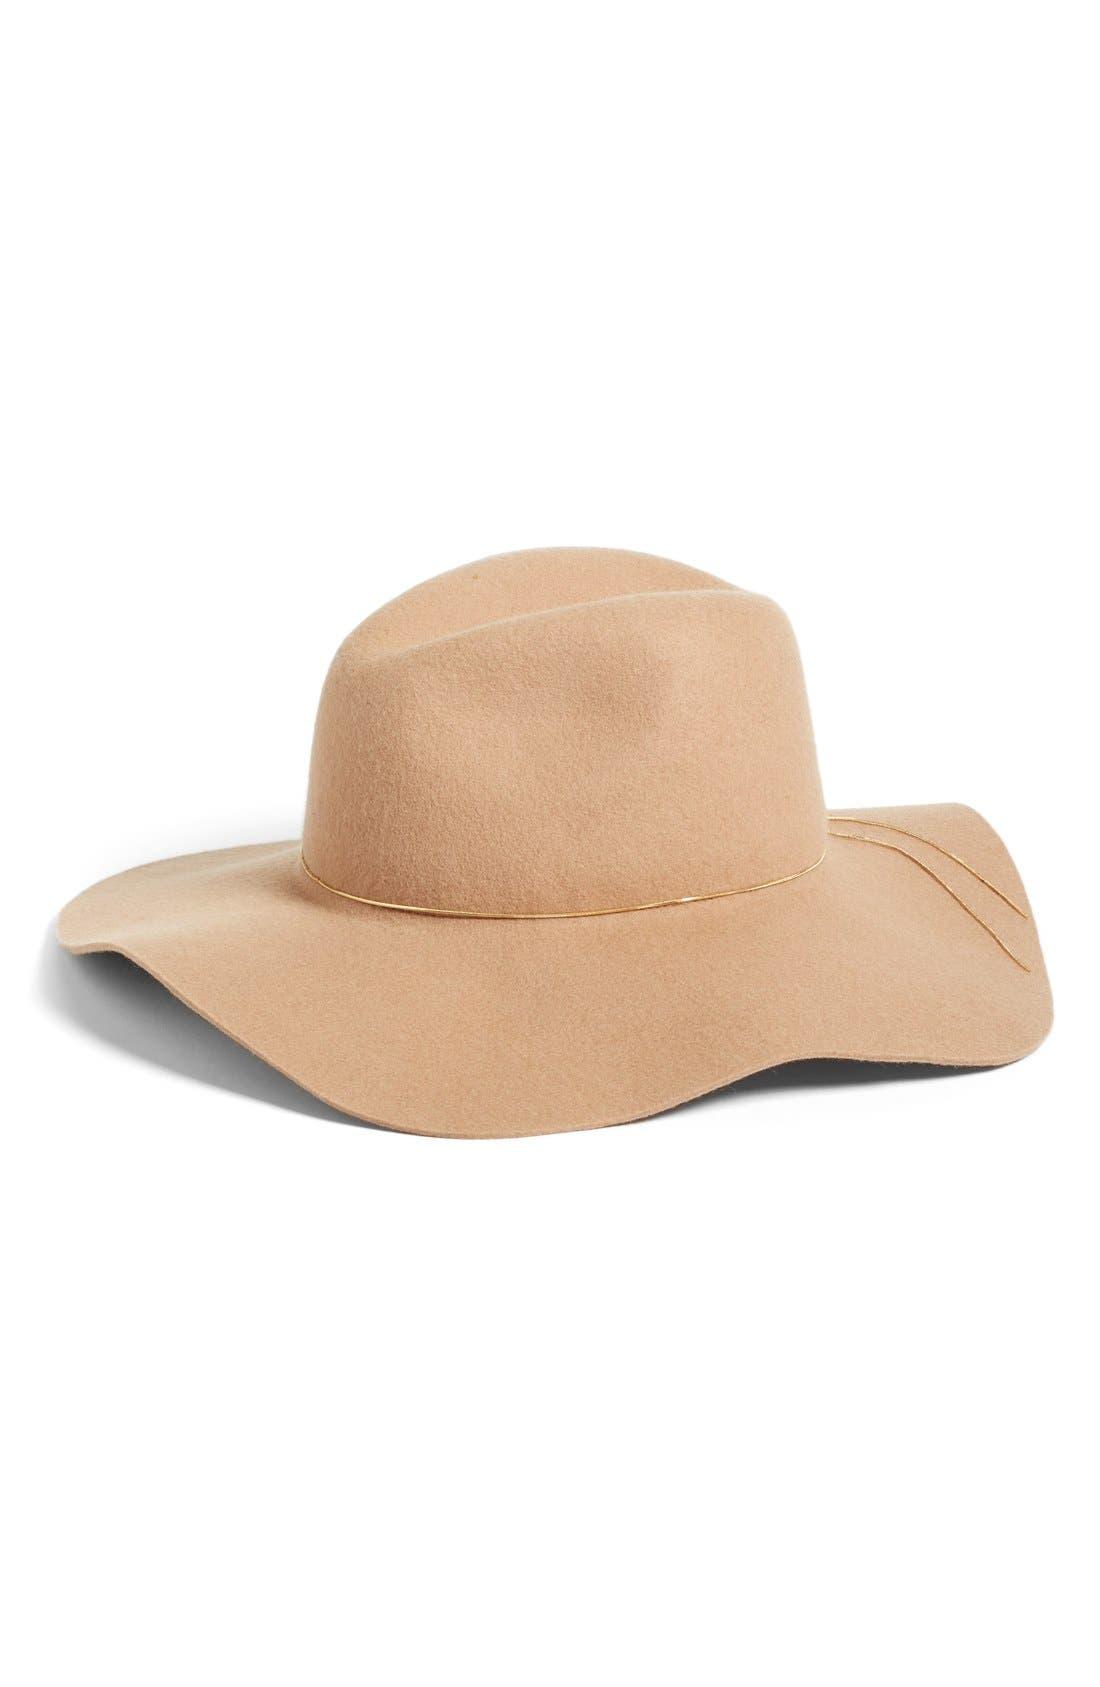 Alternate Image 1 Selected - Hinge Floppy Wool Felt Hat